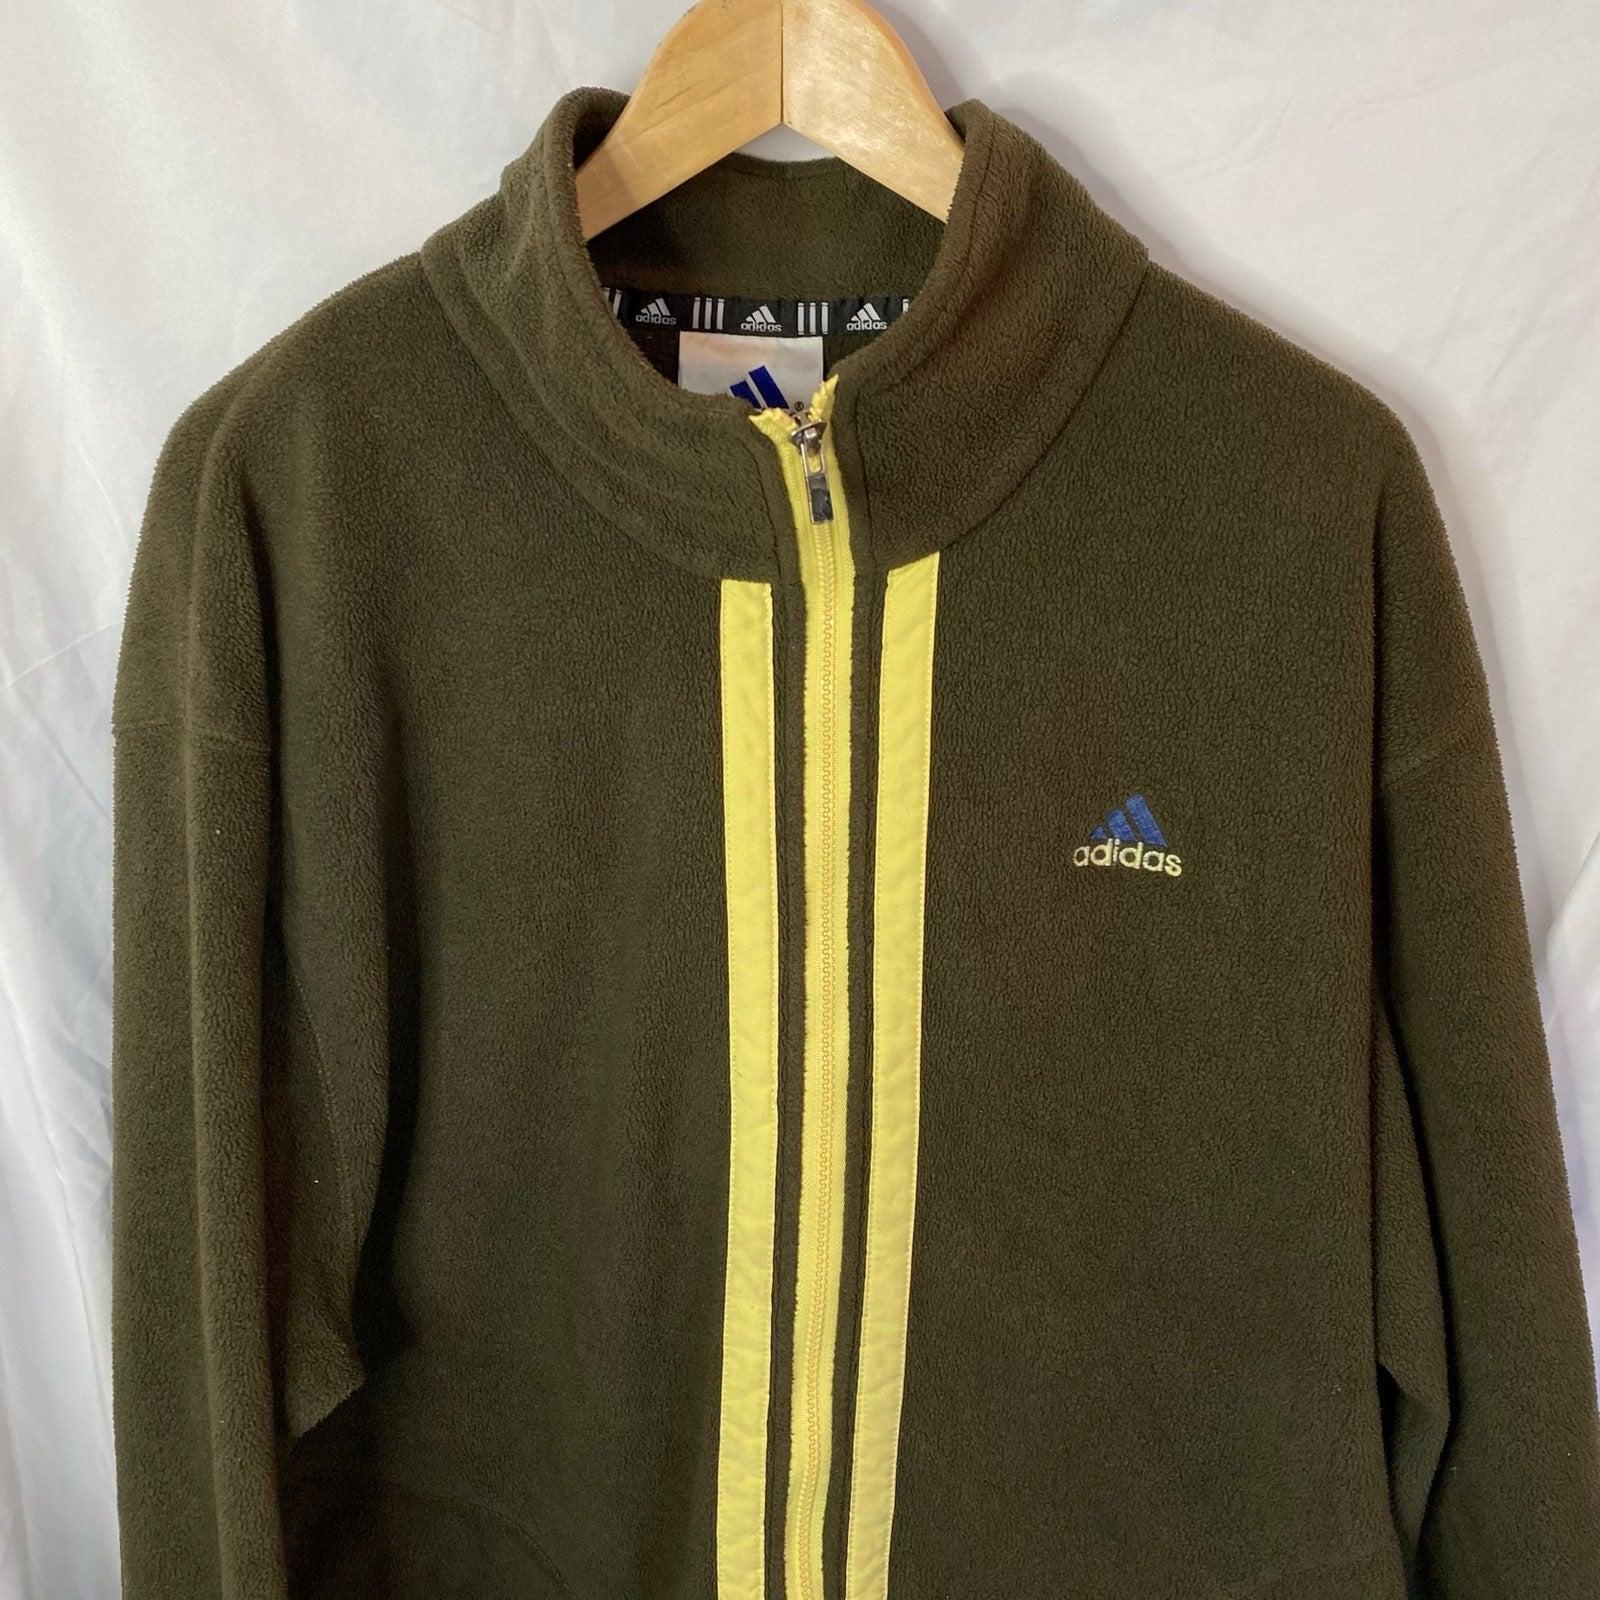 Vintage 90s Adidas Fleece Jacket